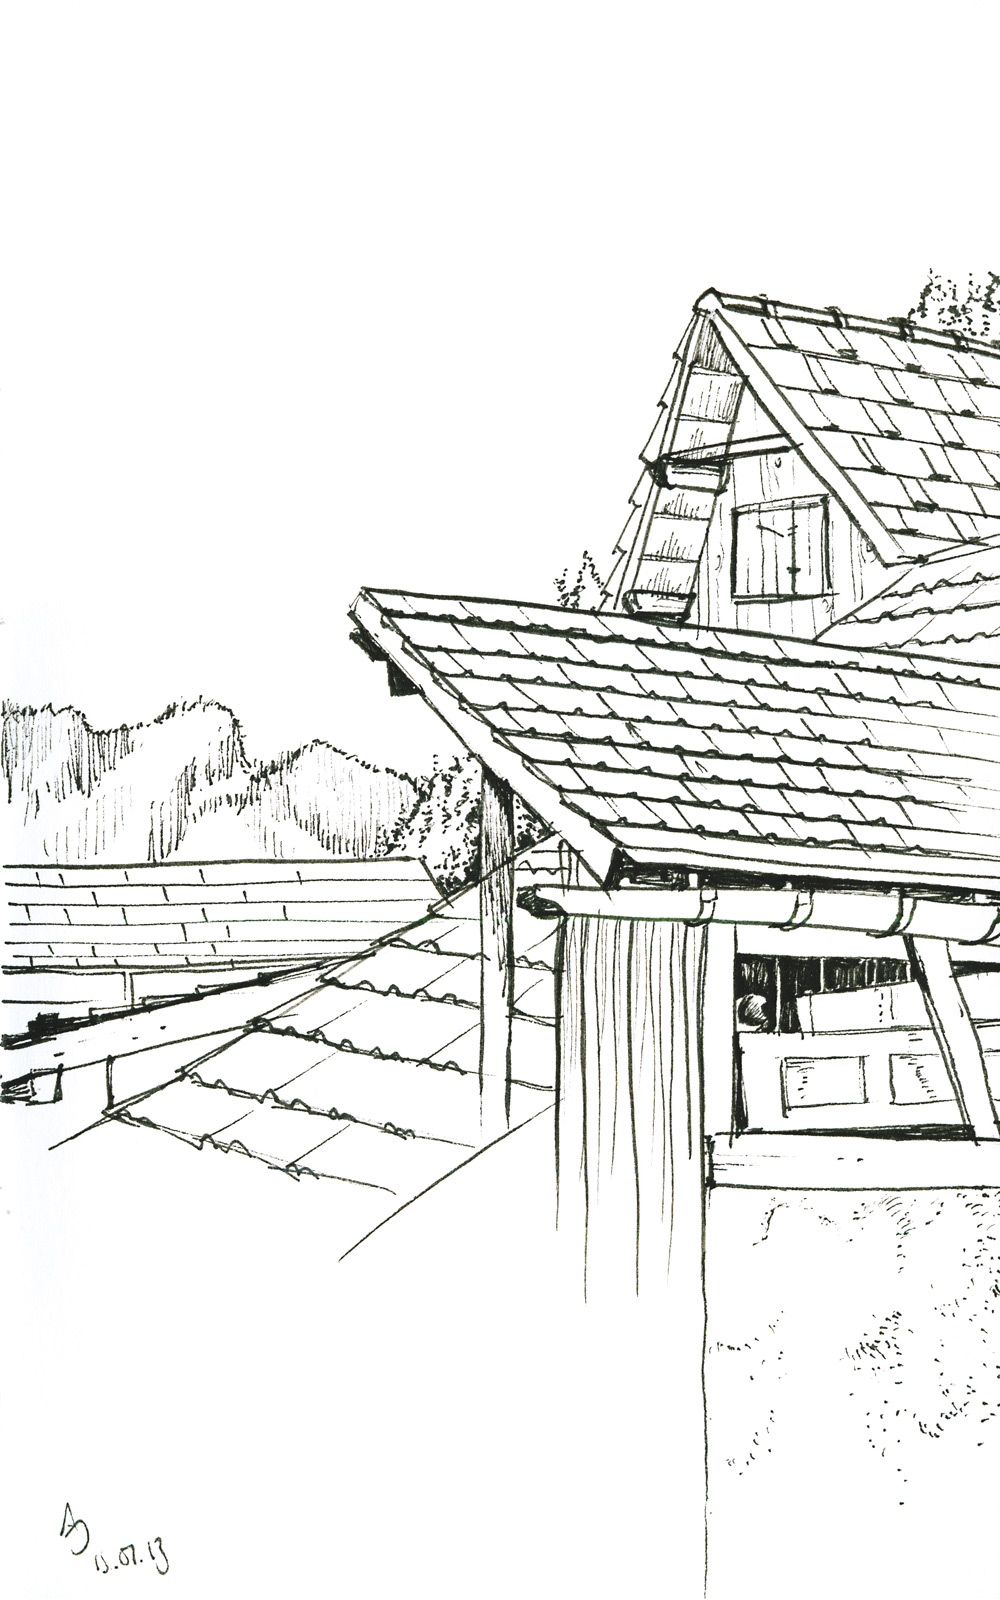 swiss_roofs_3.jpg